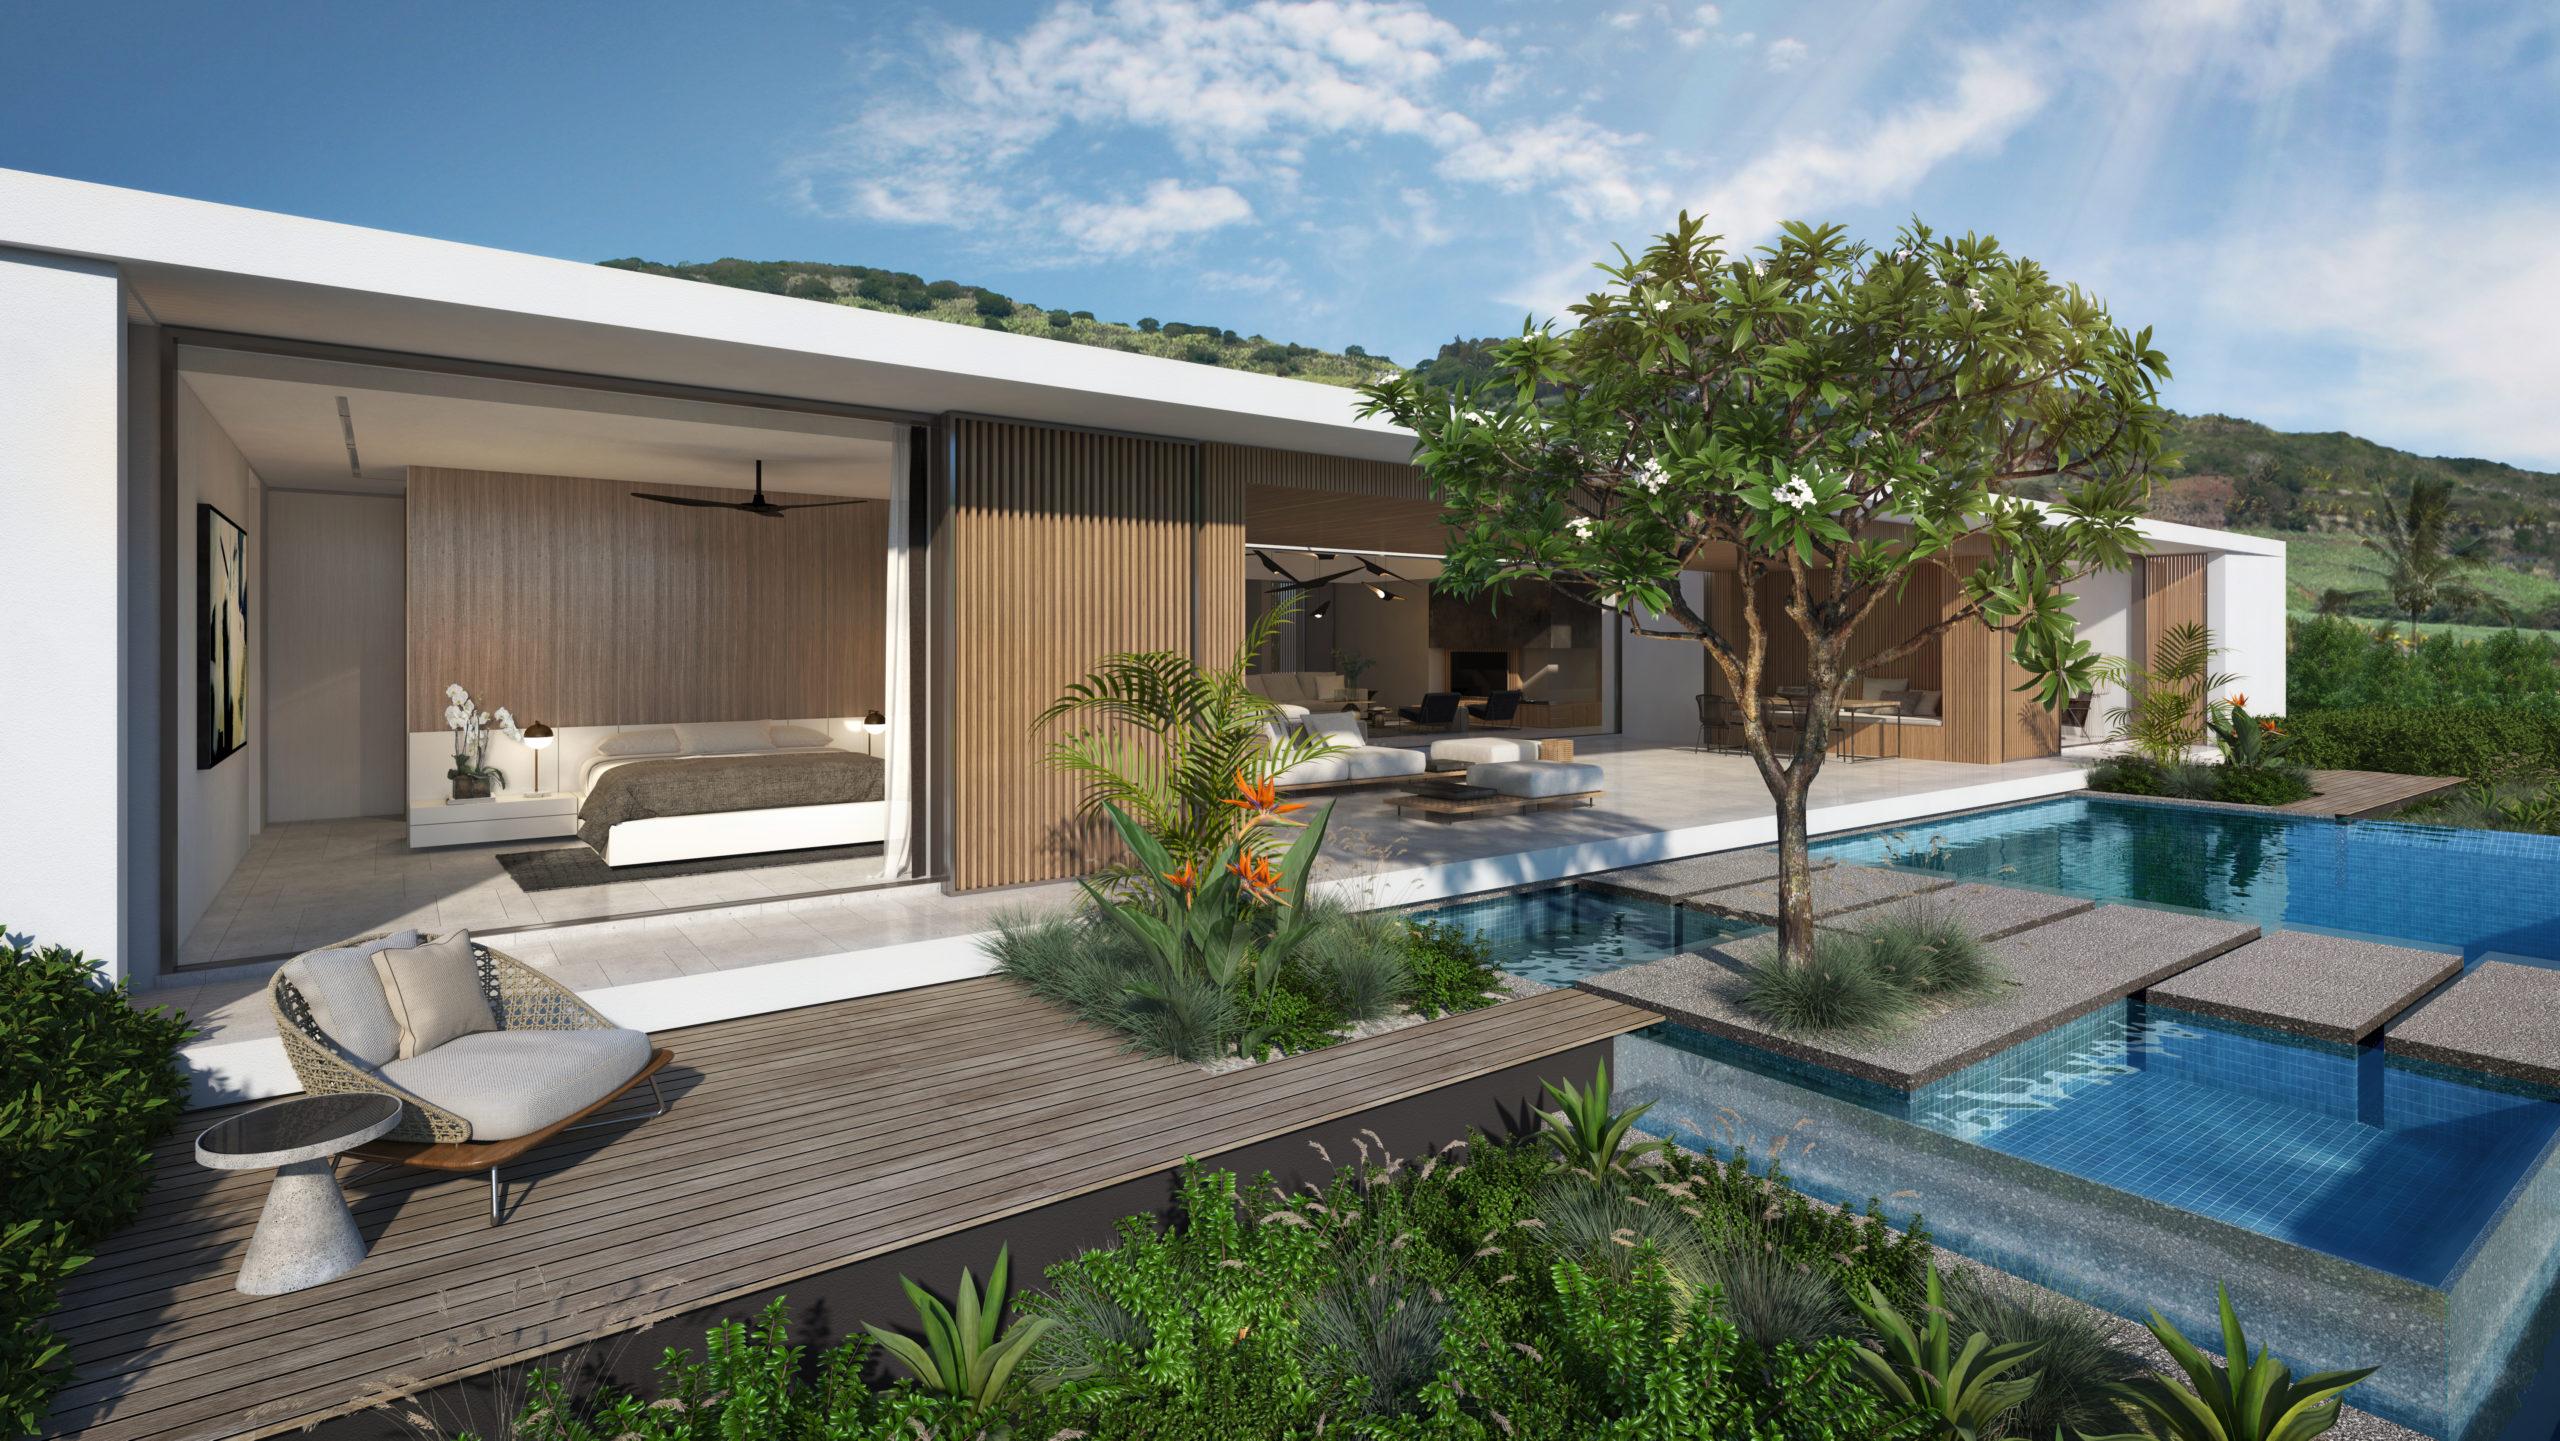 Grande Villa 4 chambres avec terrasses couvertes